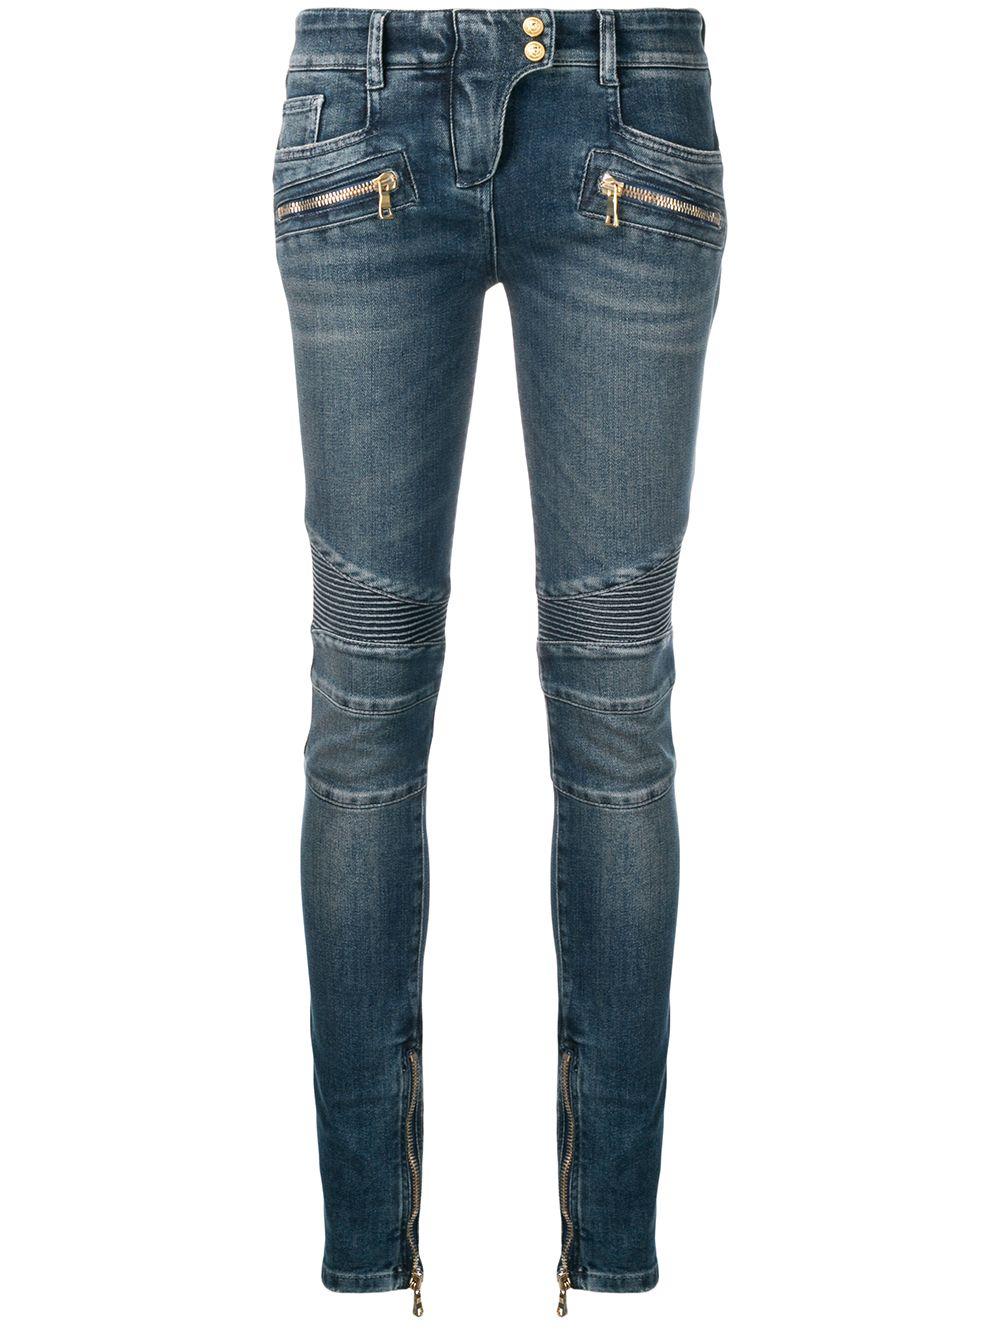 BALMAIN | байкерские джинсы скинни | Clouty